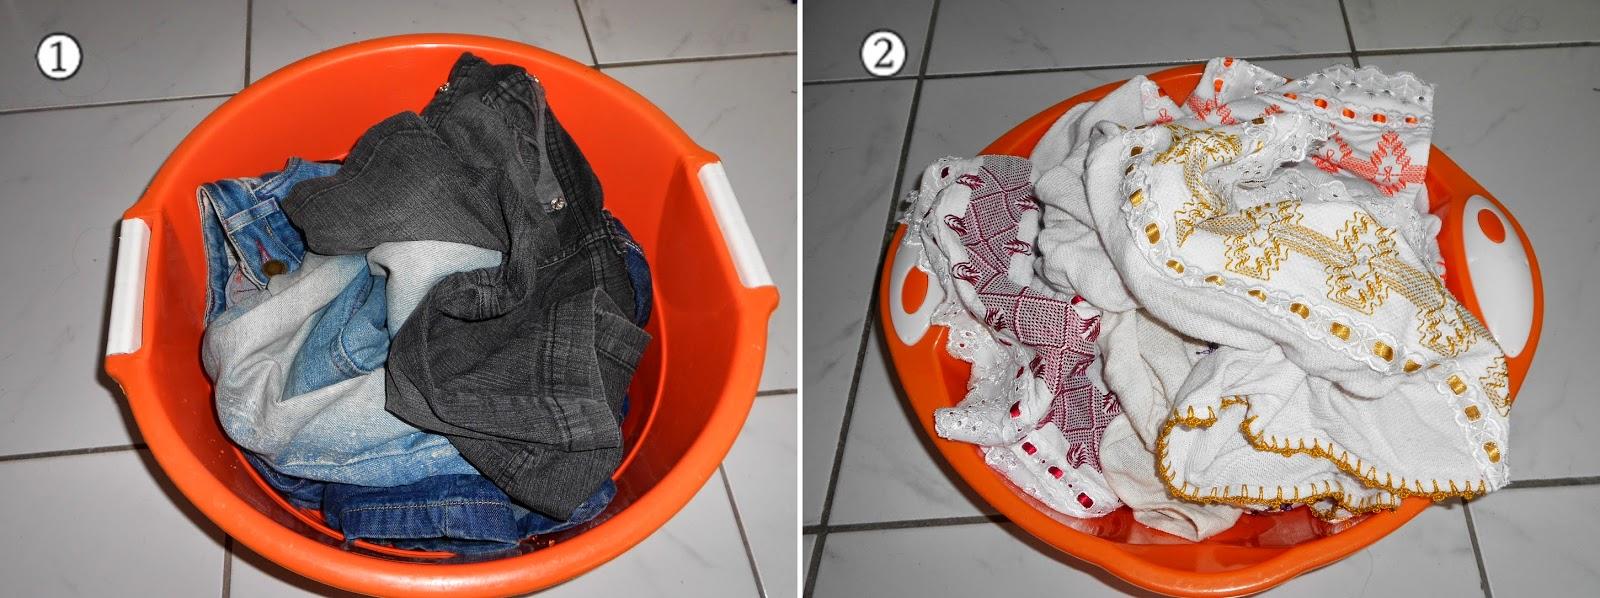 lavando roupa na máquina